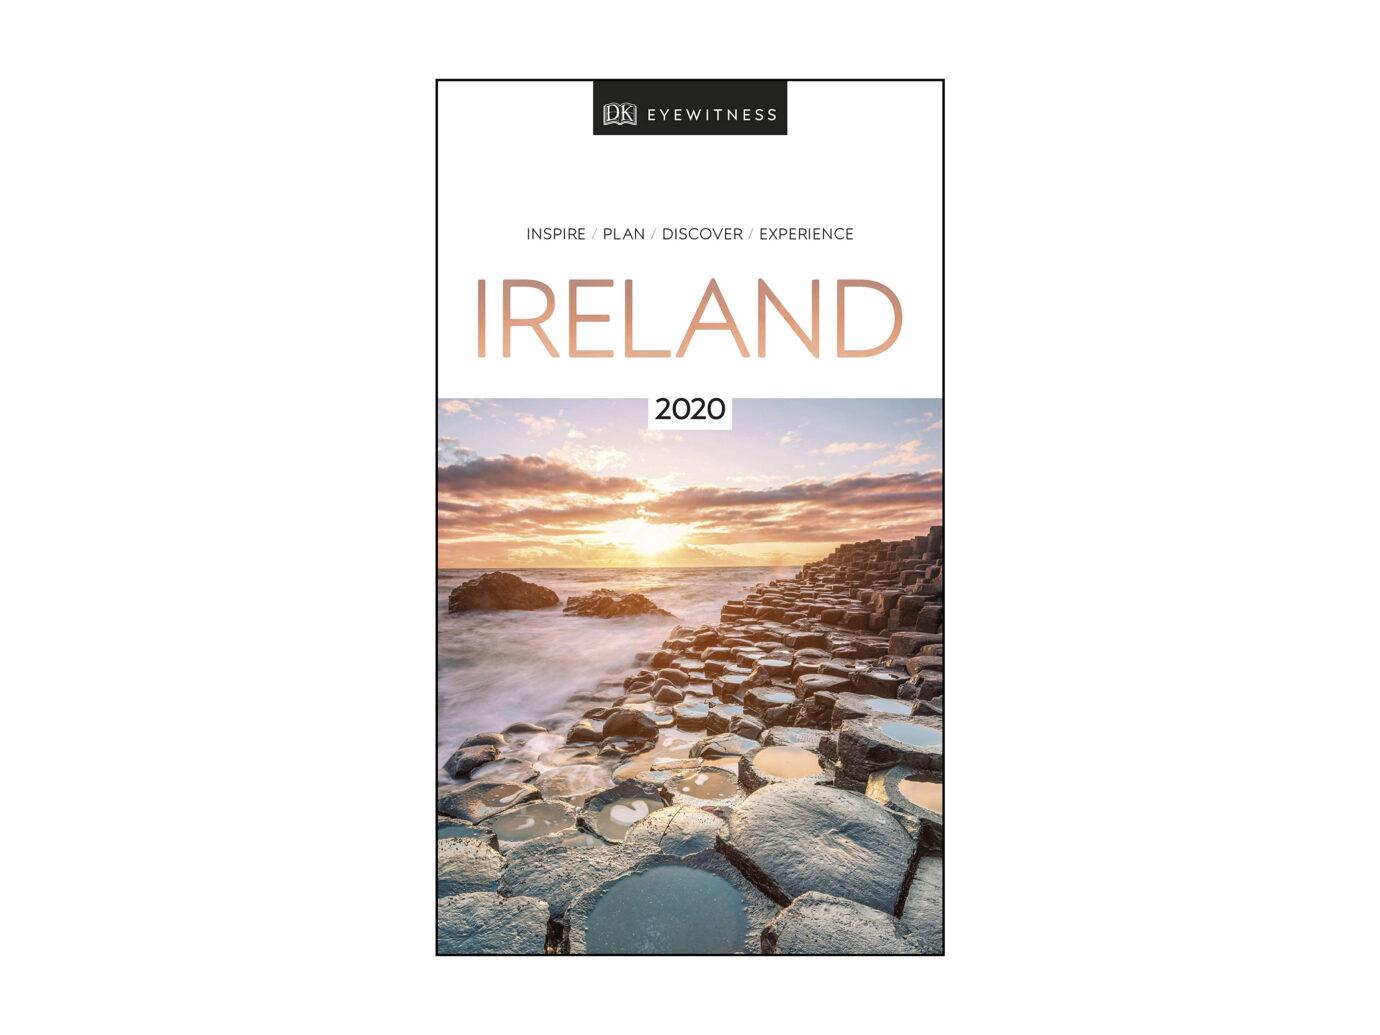 DK Eyewitness Travel Guide Ireland: 2020